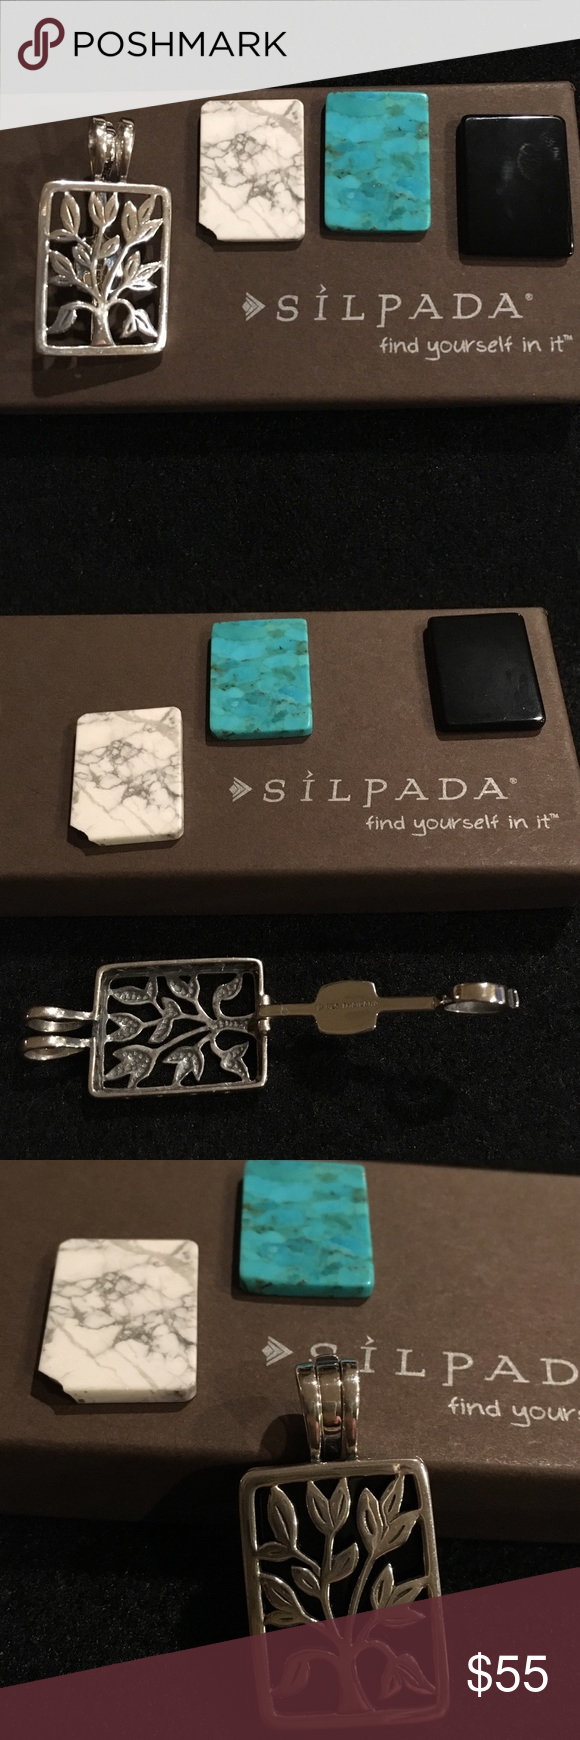 SILPADA PENDANT Silpada tree pendant. Live,laugh,love on one side. Changeable (3) Silpada Jewelry